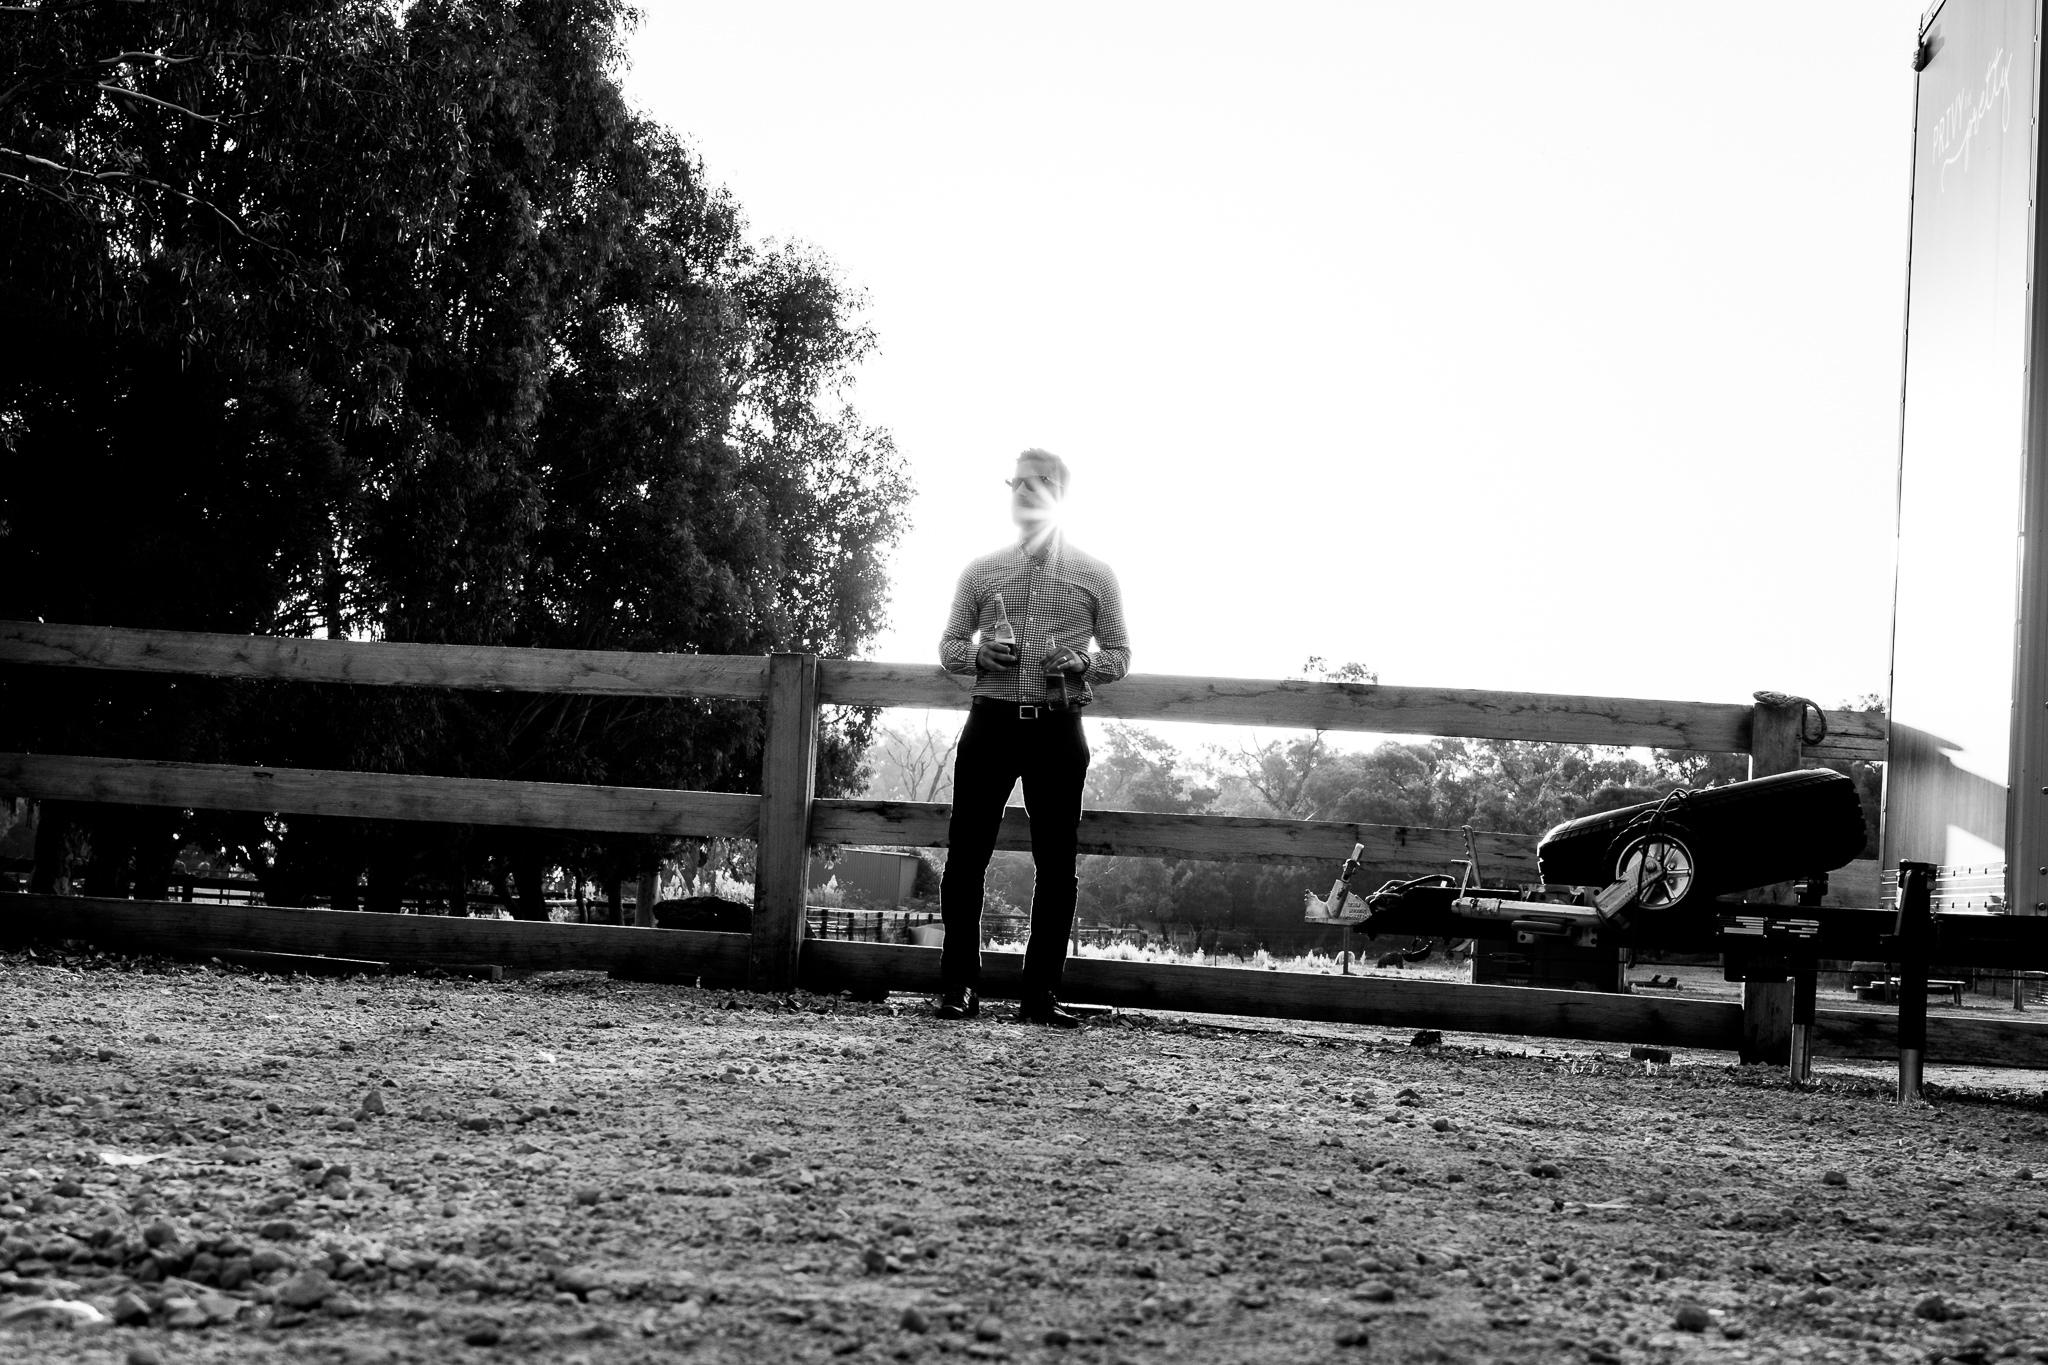 Throw your own backyard wedding, wedding photography, wedding photography melbourne, candid wedding photography, backyard wedding, throw your own wedding, getting married at home, melbourne wedding photography, melbourne wedding photographer, Mornington peninsula wedding photographer, Mornington peninsula wedding, wedding photographer, flint street photography, DIY wedding, documentary wedding photographer, wedding photojournalist